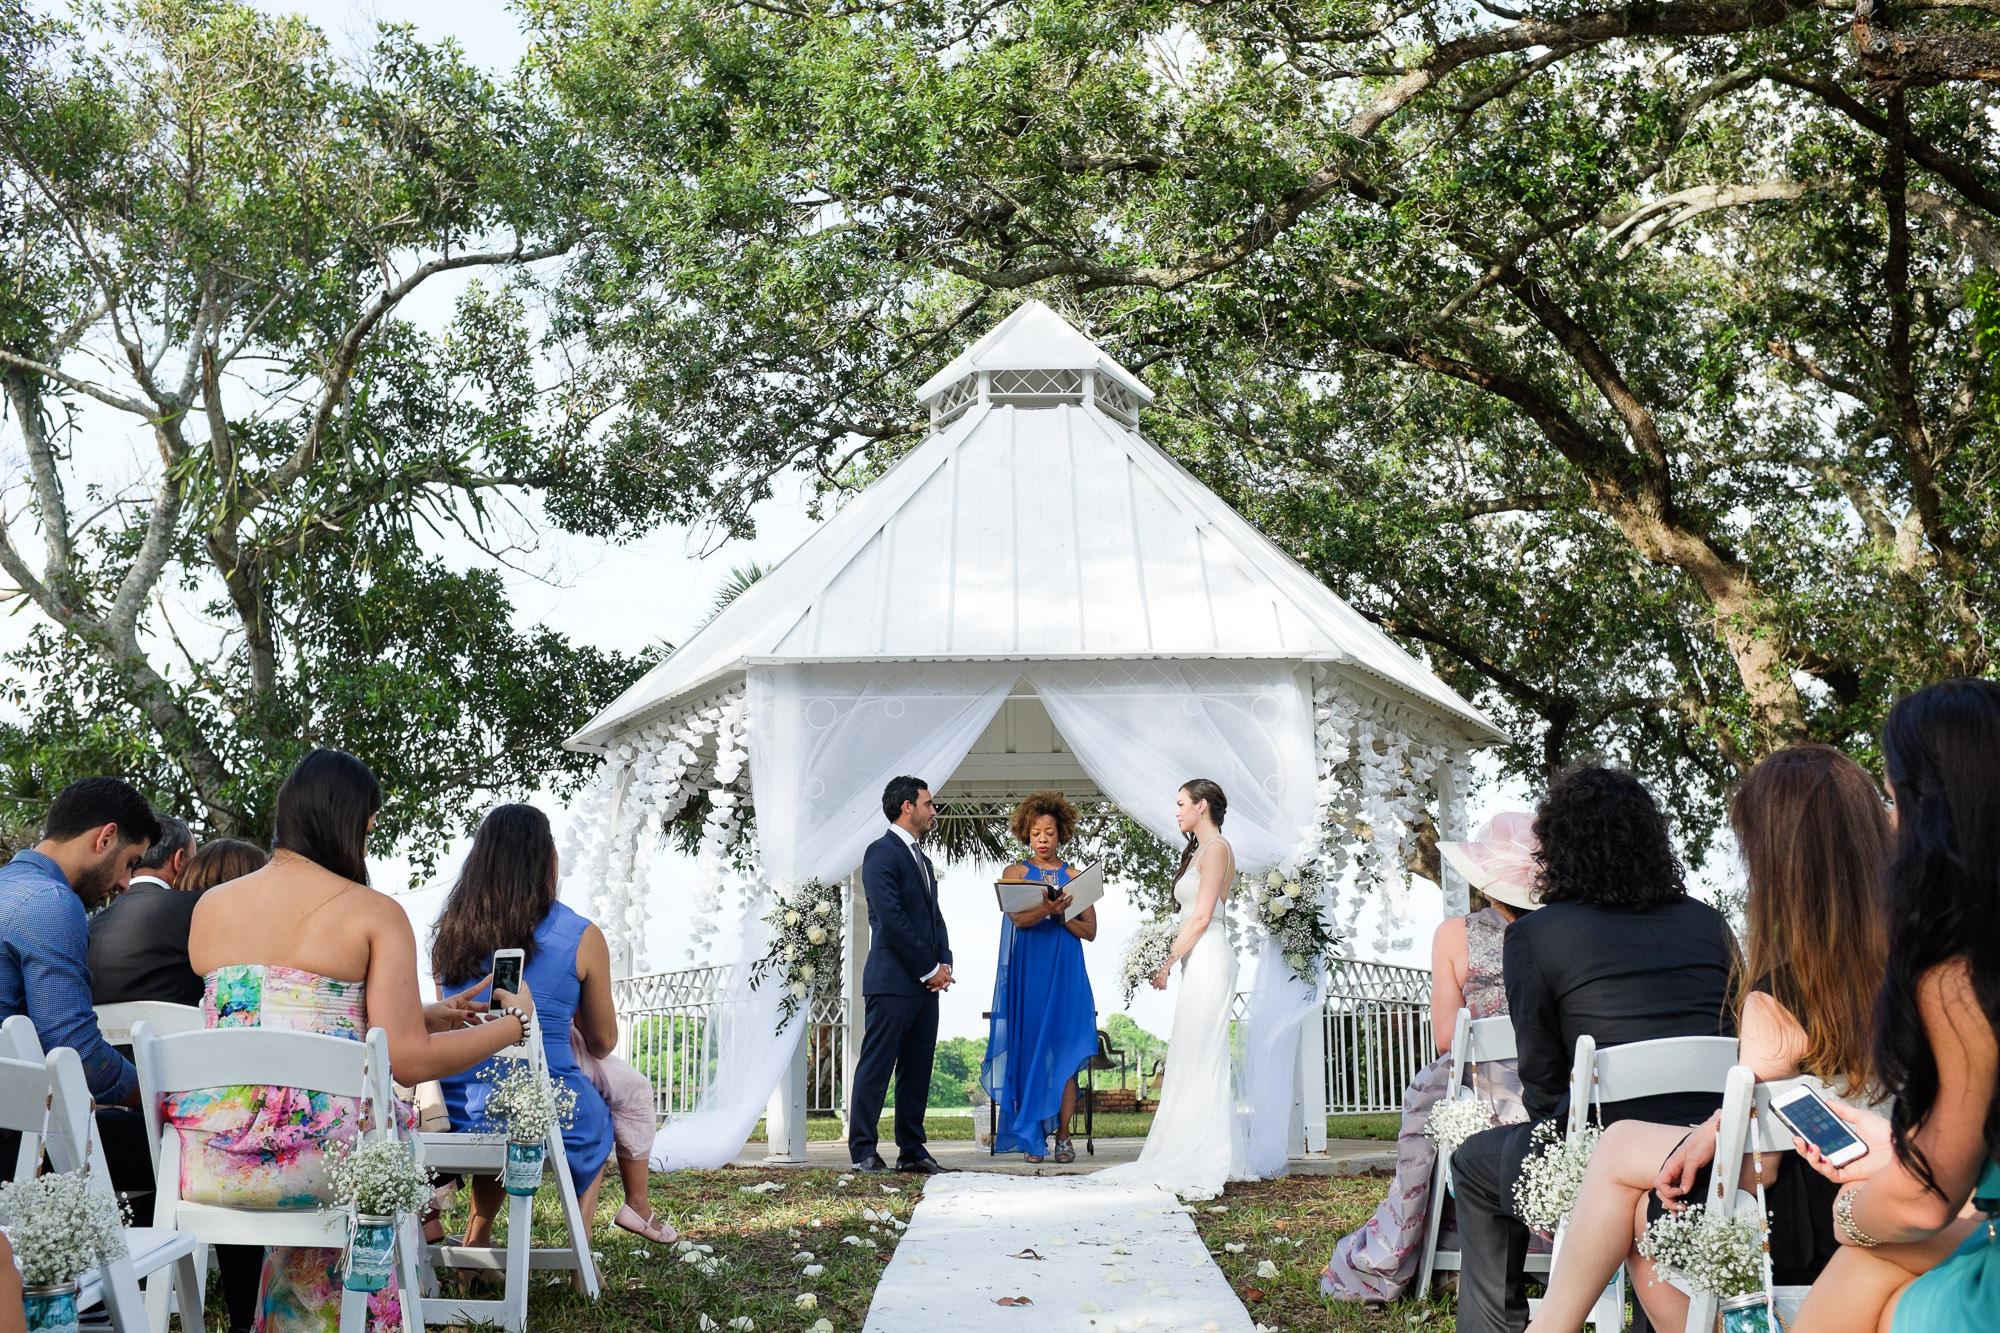 robbins lodge outdoor rustic wedding